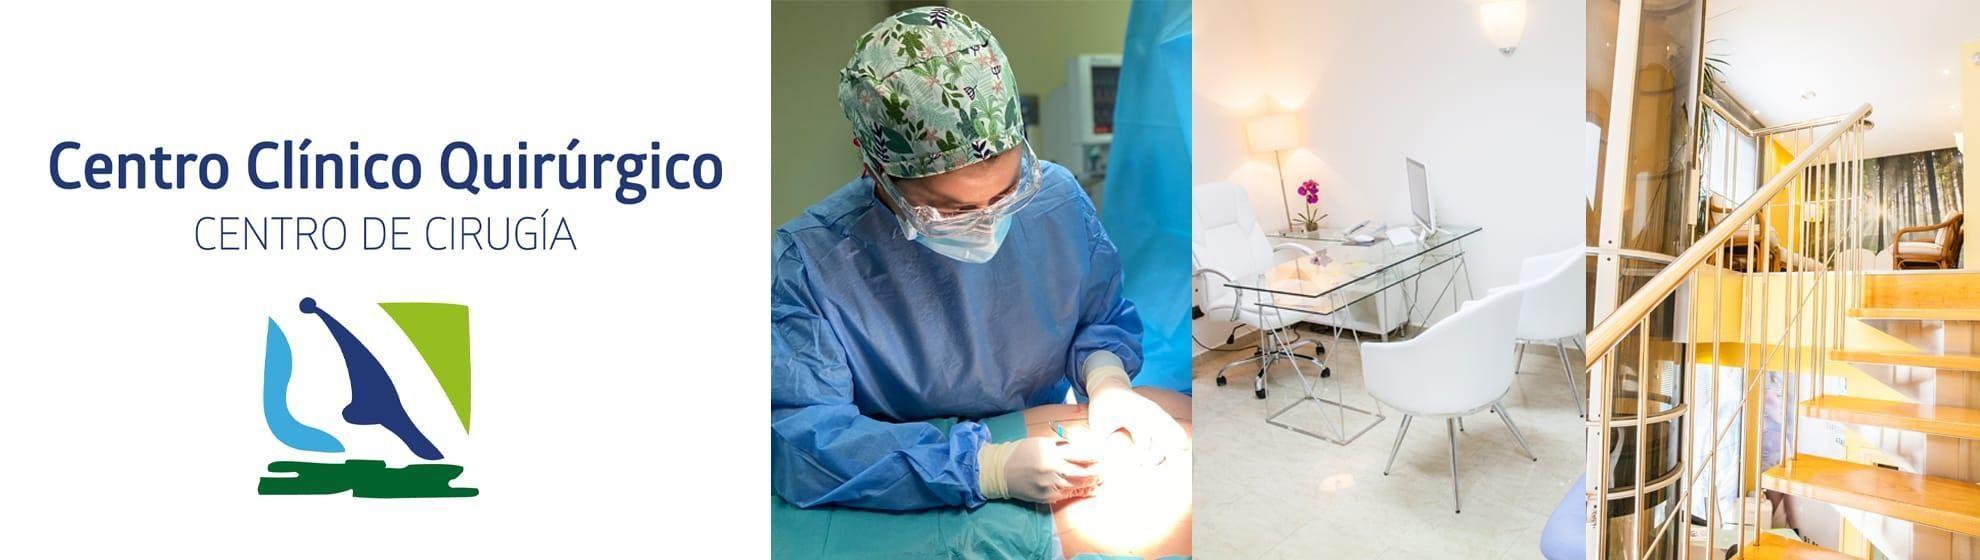 Centro Clínico Quirúrgico Aranjuez